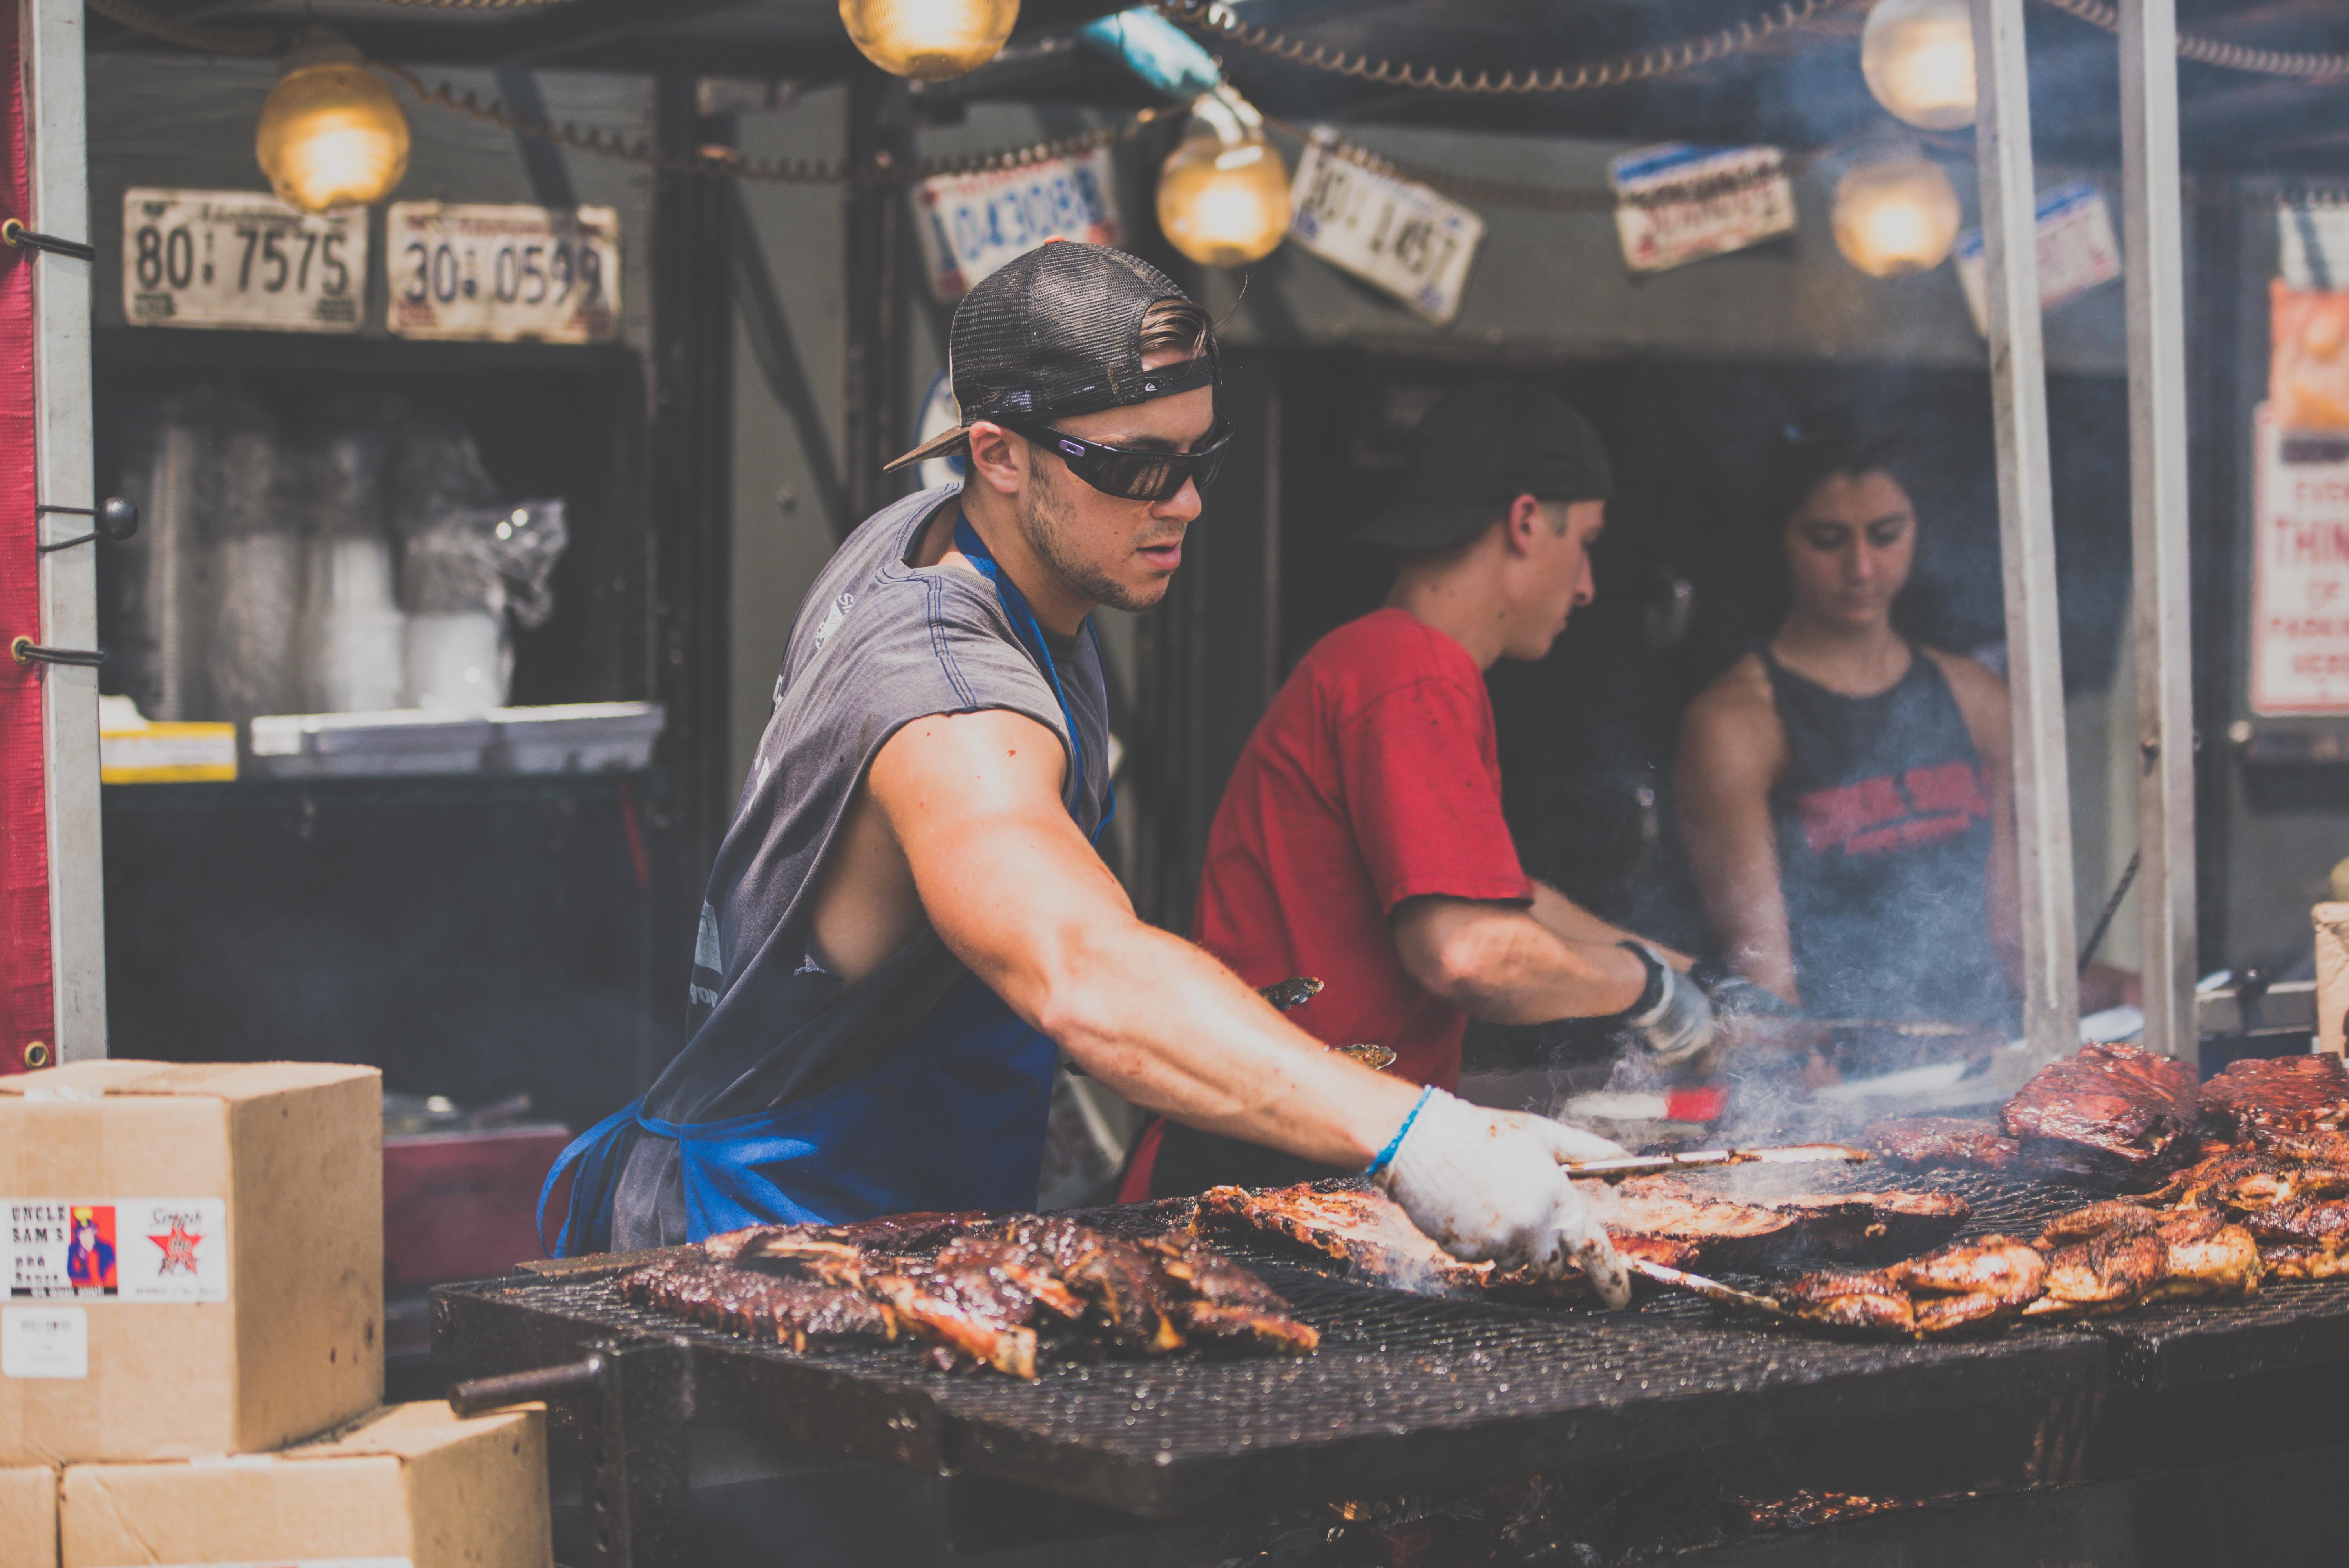 Free Images Smoke Dish Vendor Bbq Barbeque Market